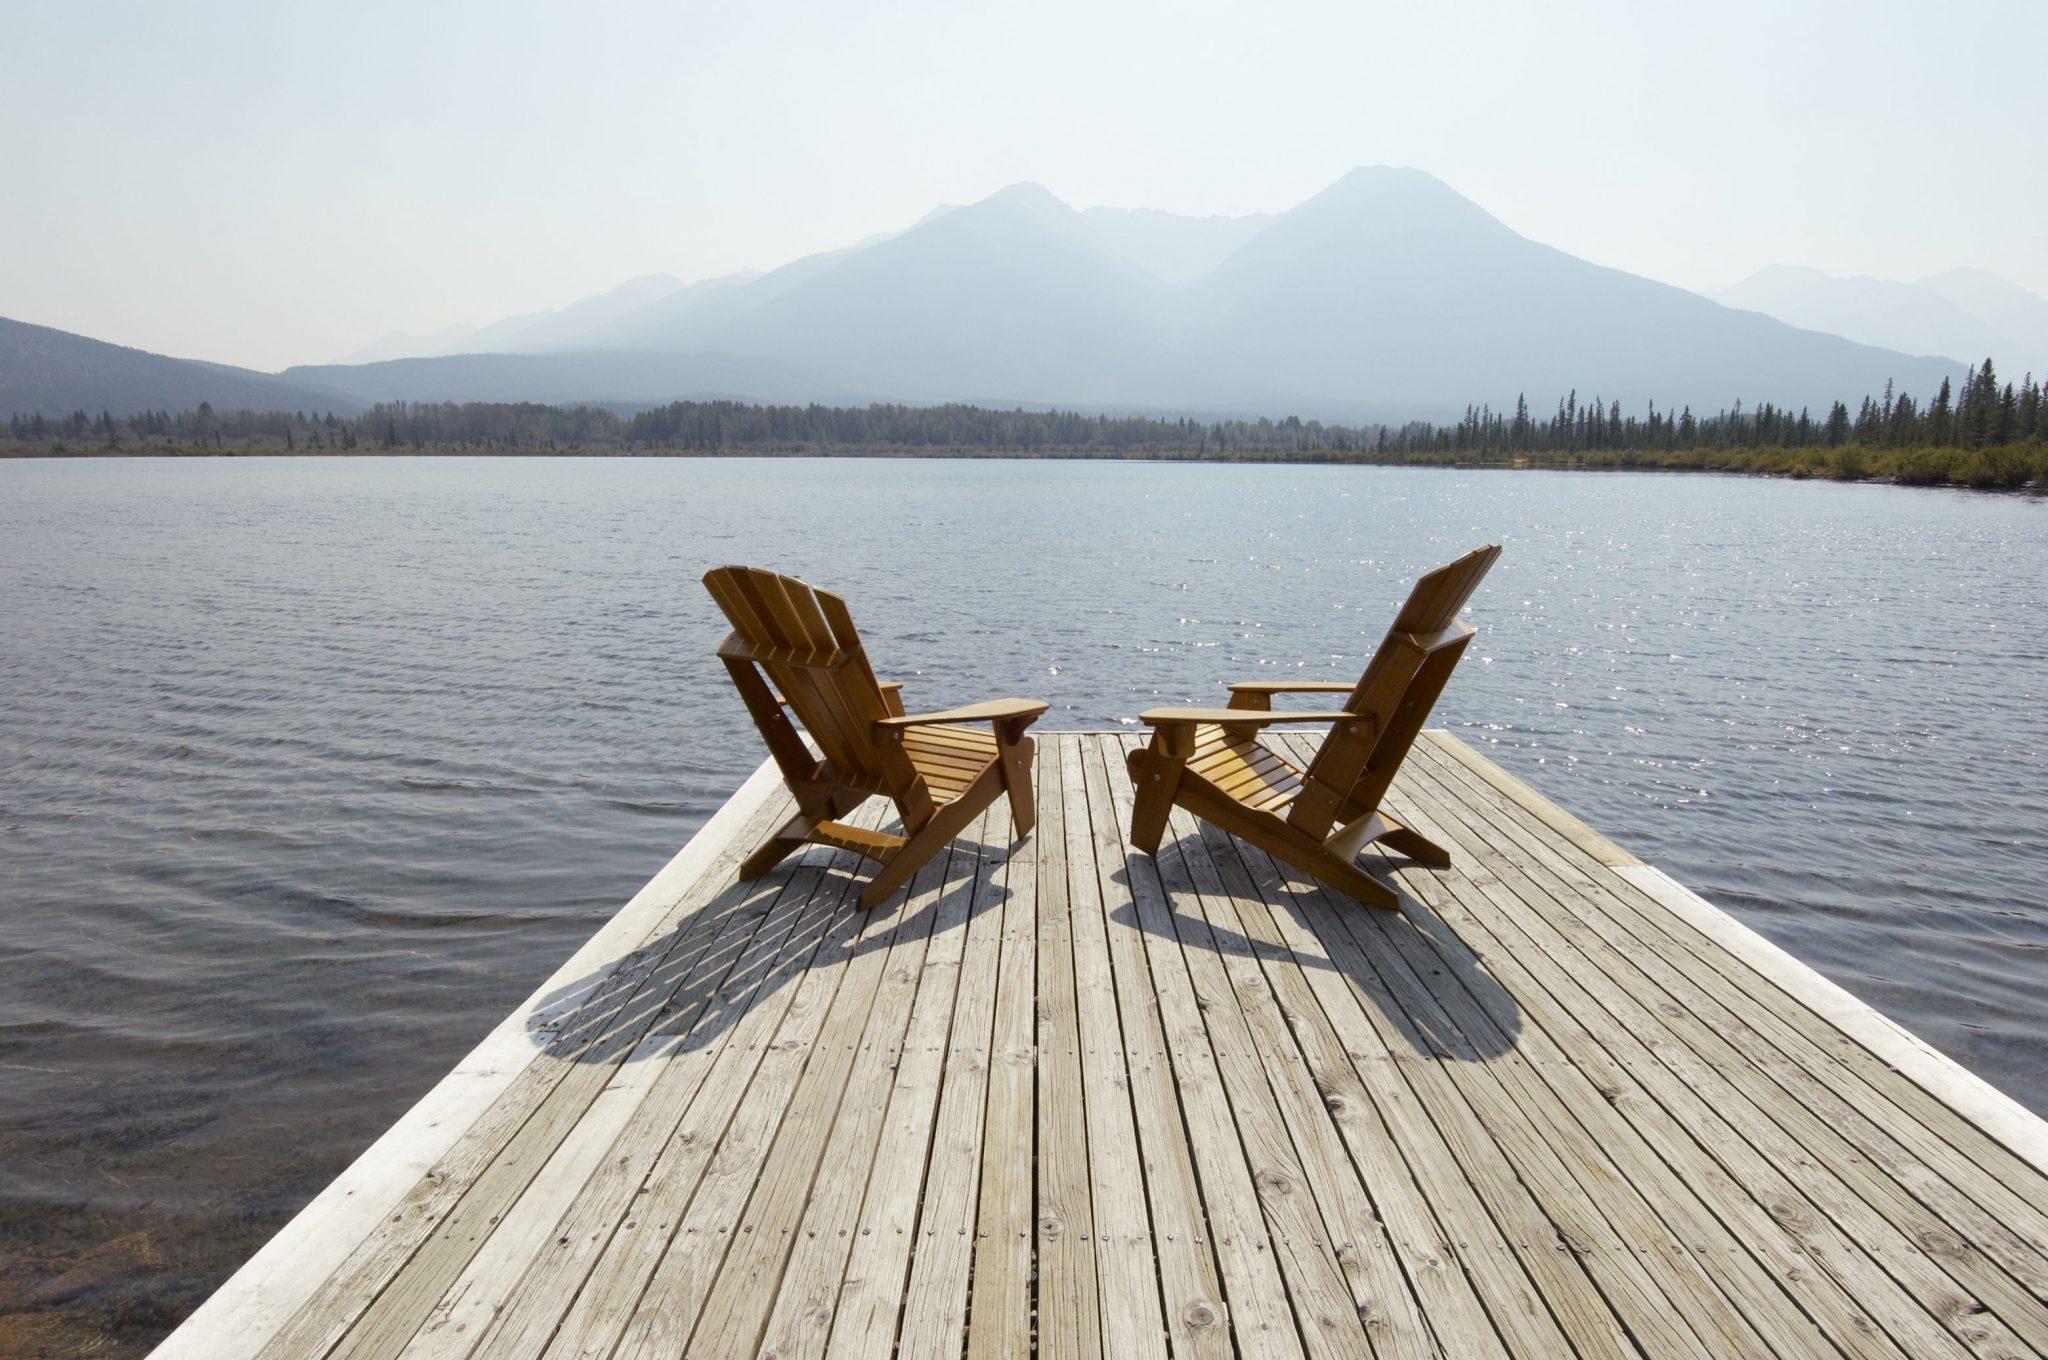 One Minute Meditation – Find Joy